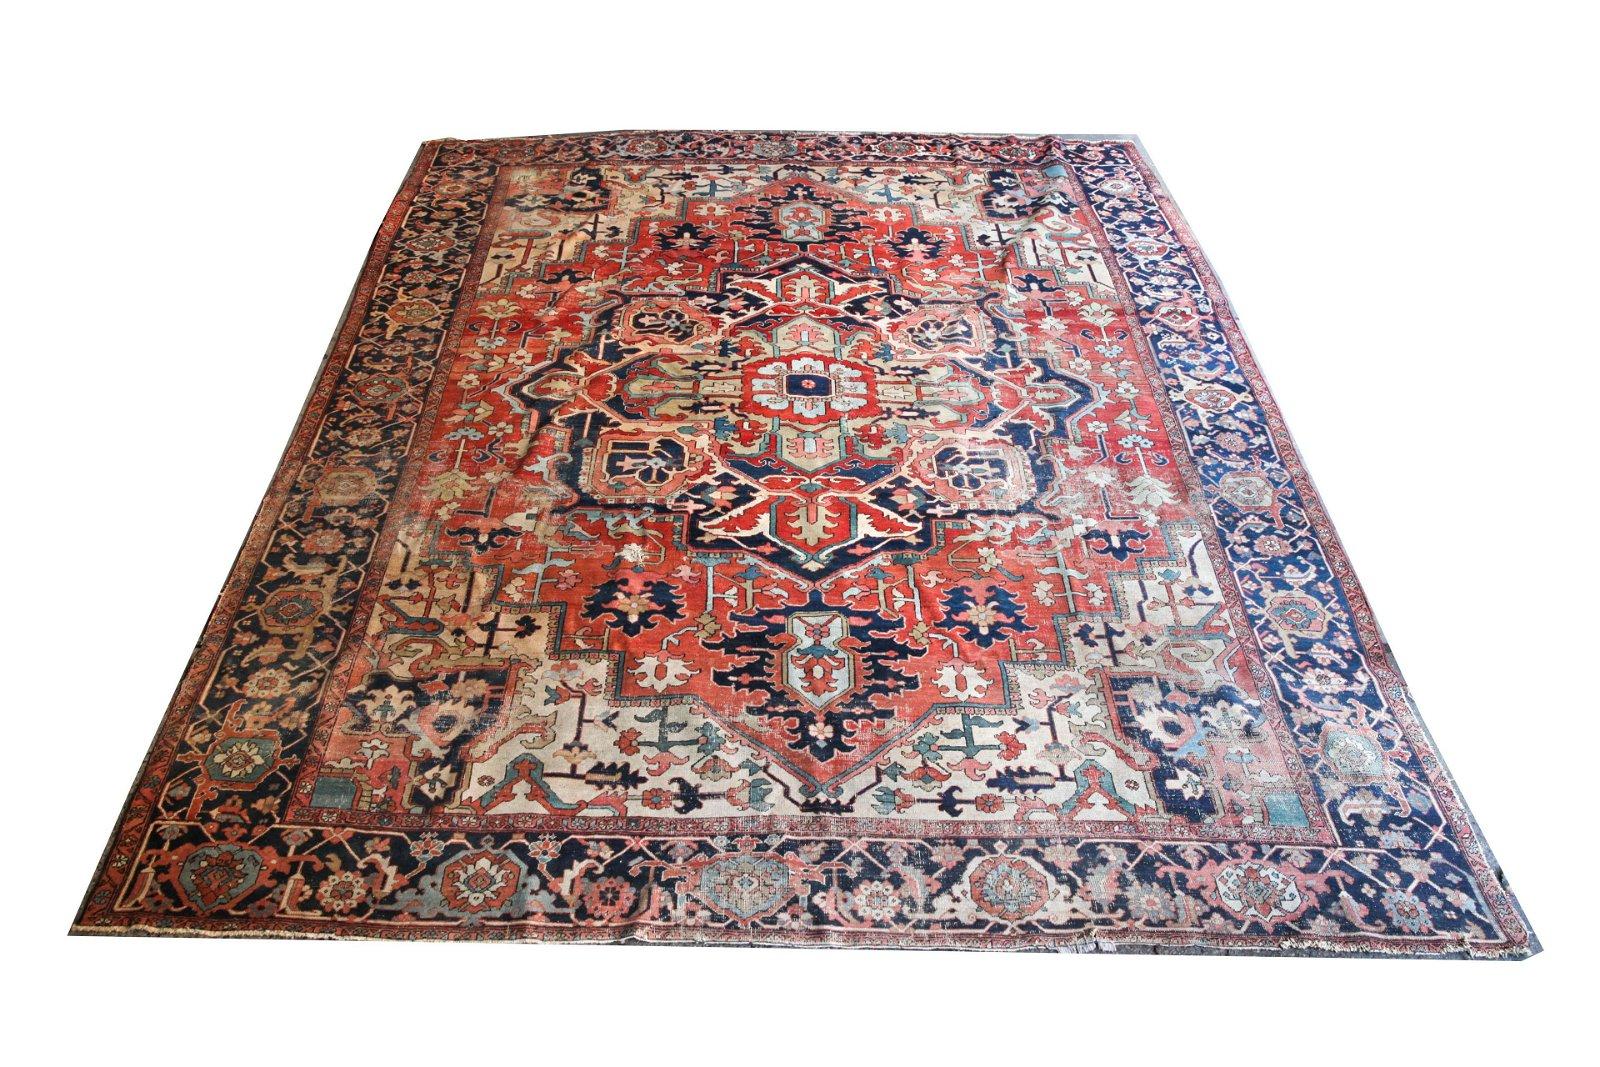 "Persian Carpet 13' 2"" x 10' 7"""